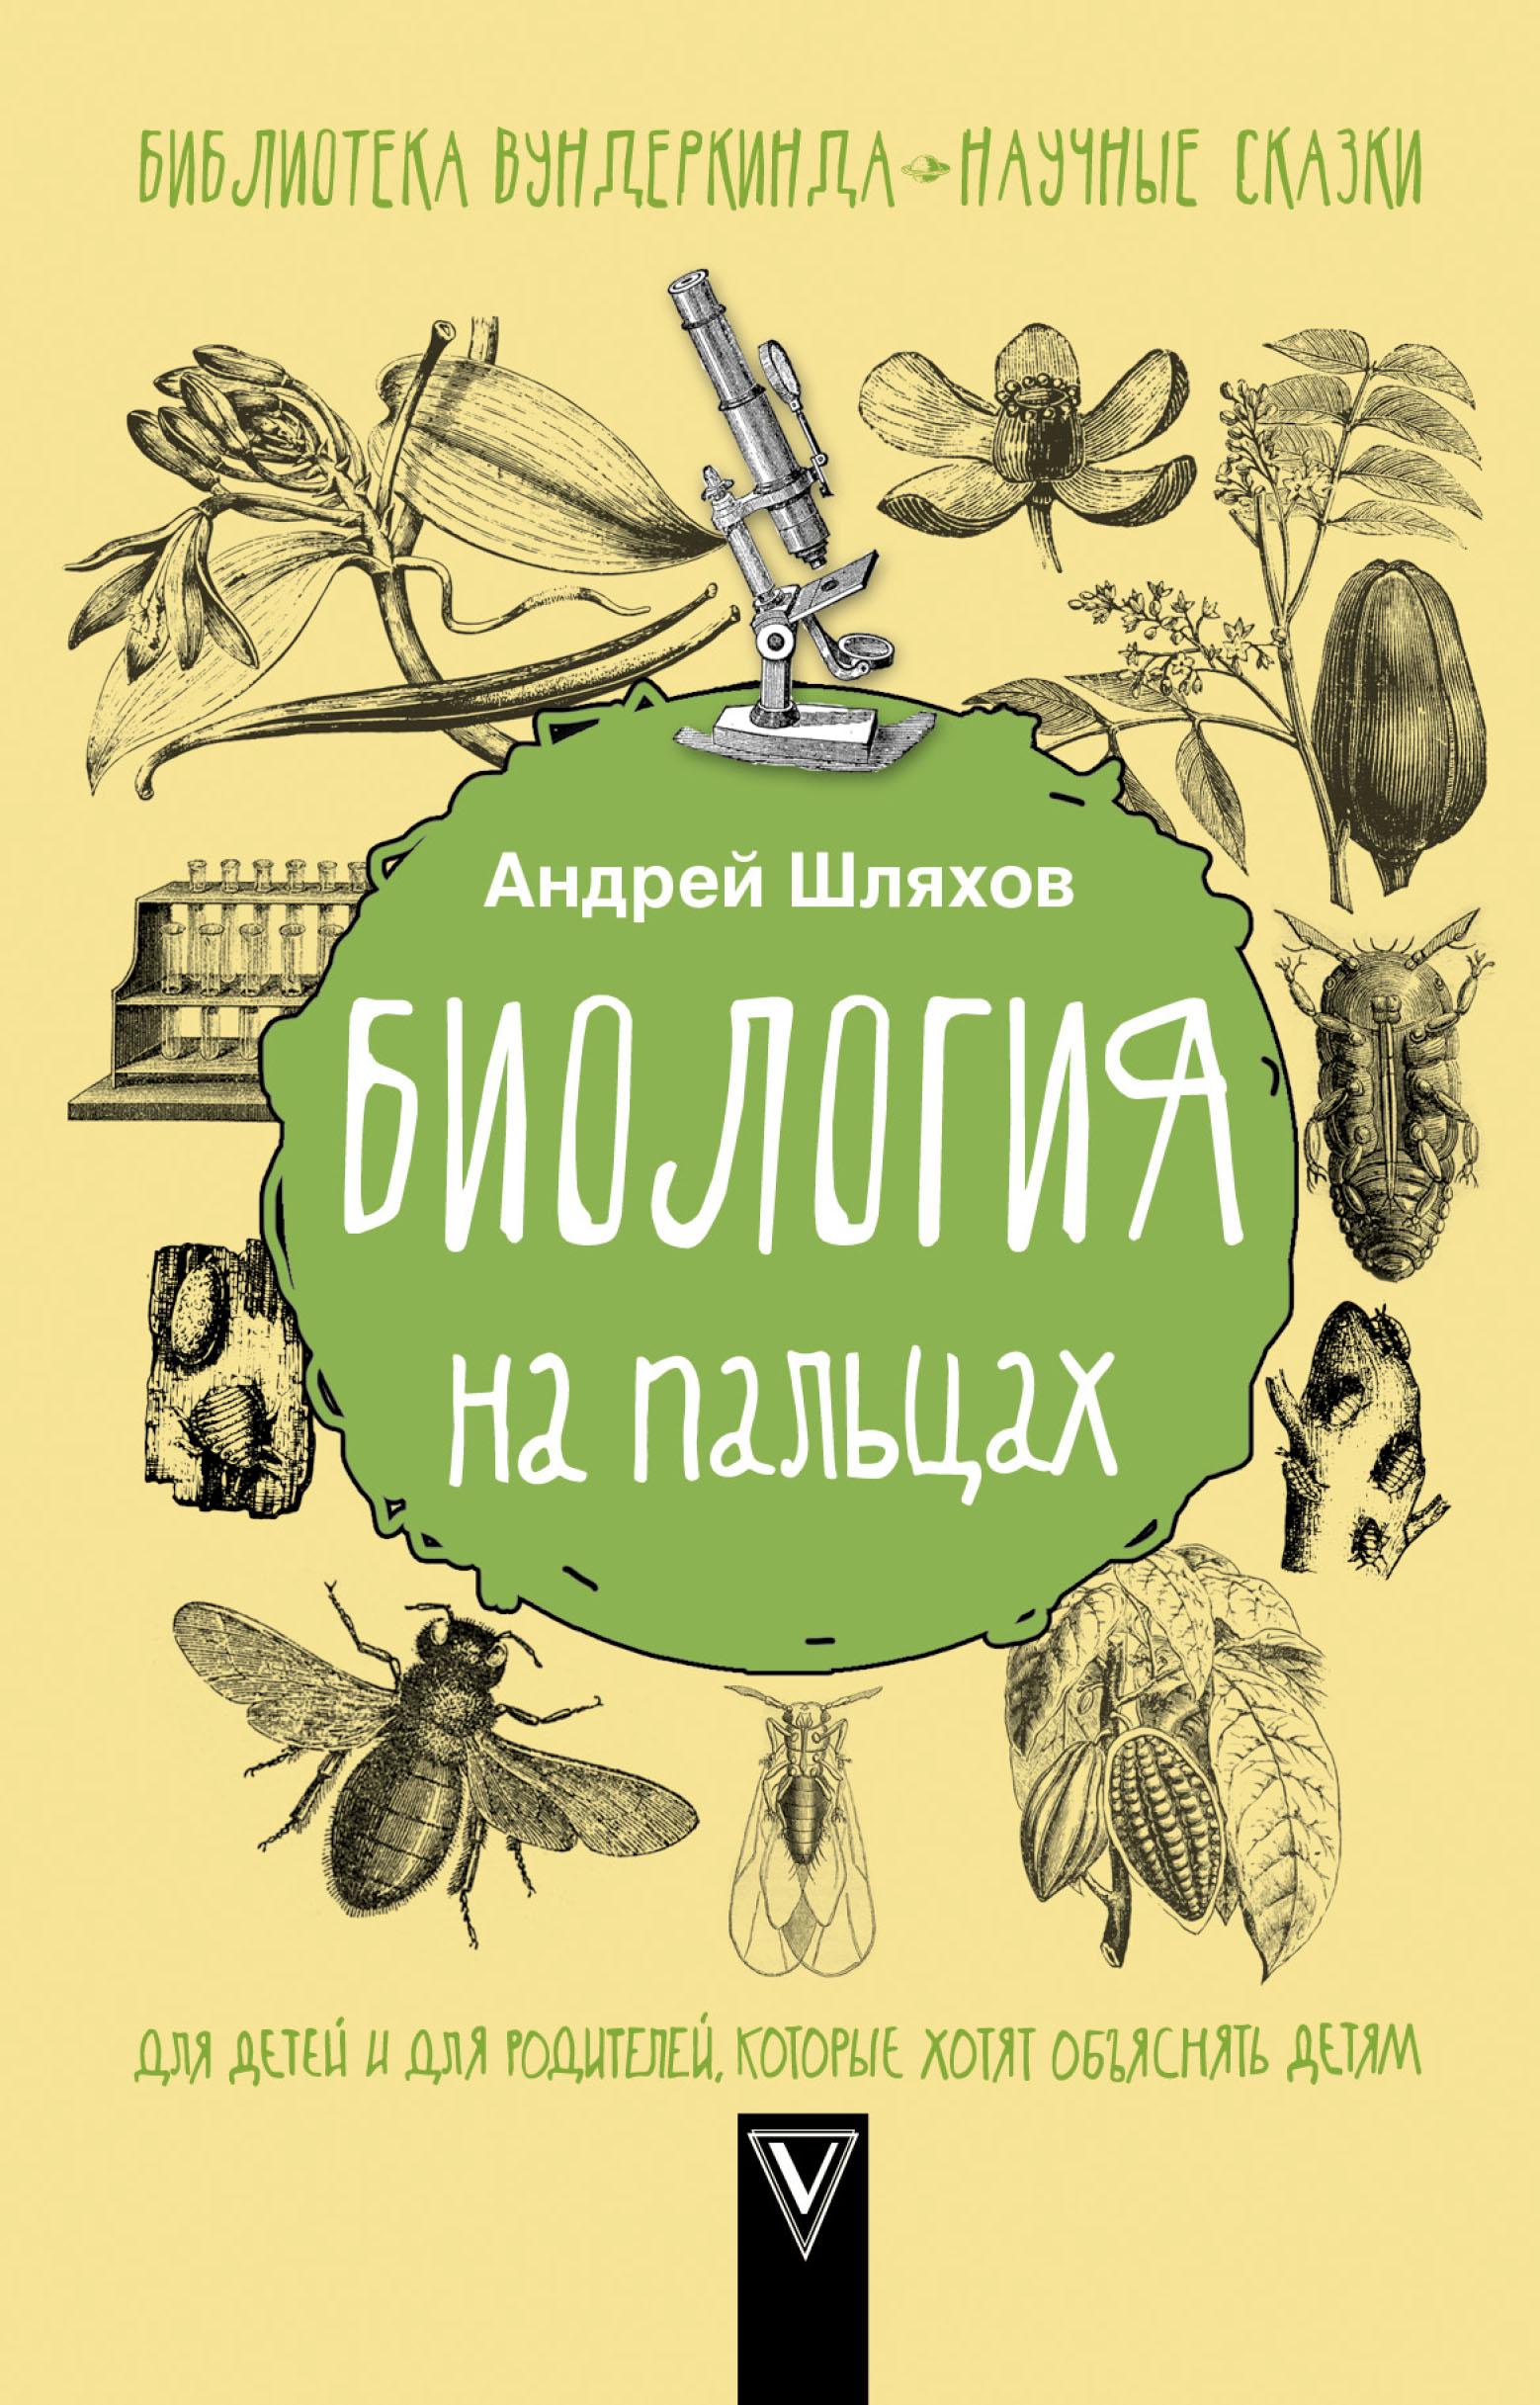 Андрей Шляхов Биология на пальцах шляхов а география на пальцах